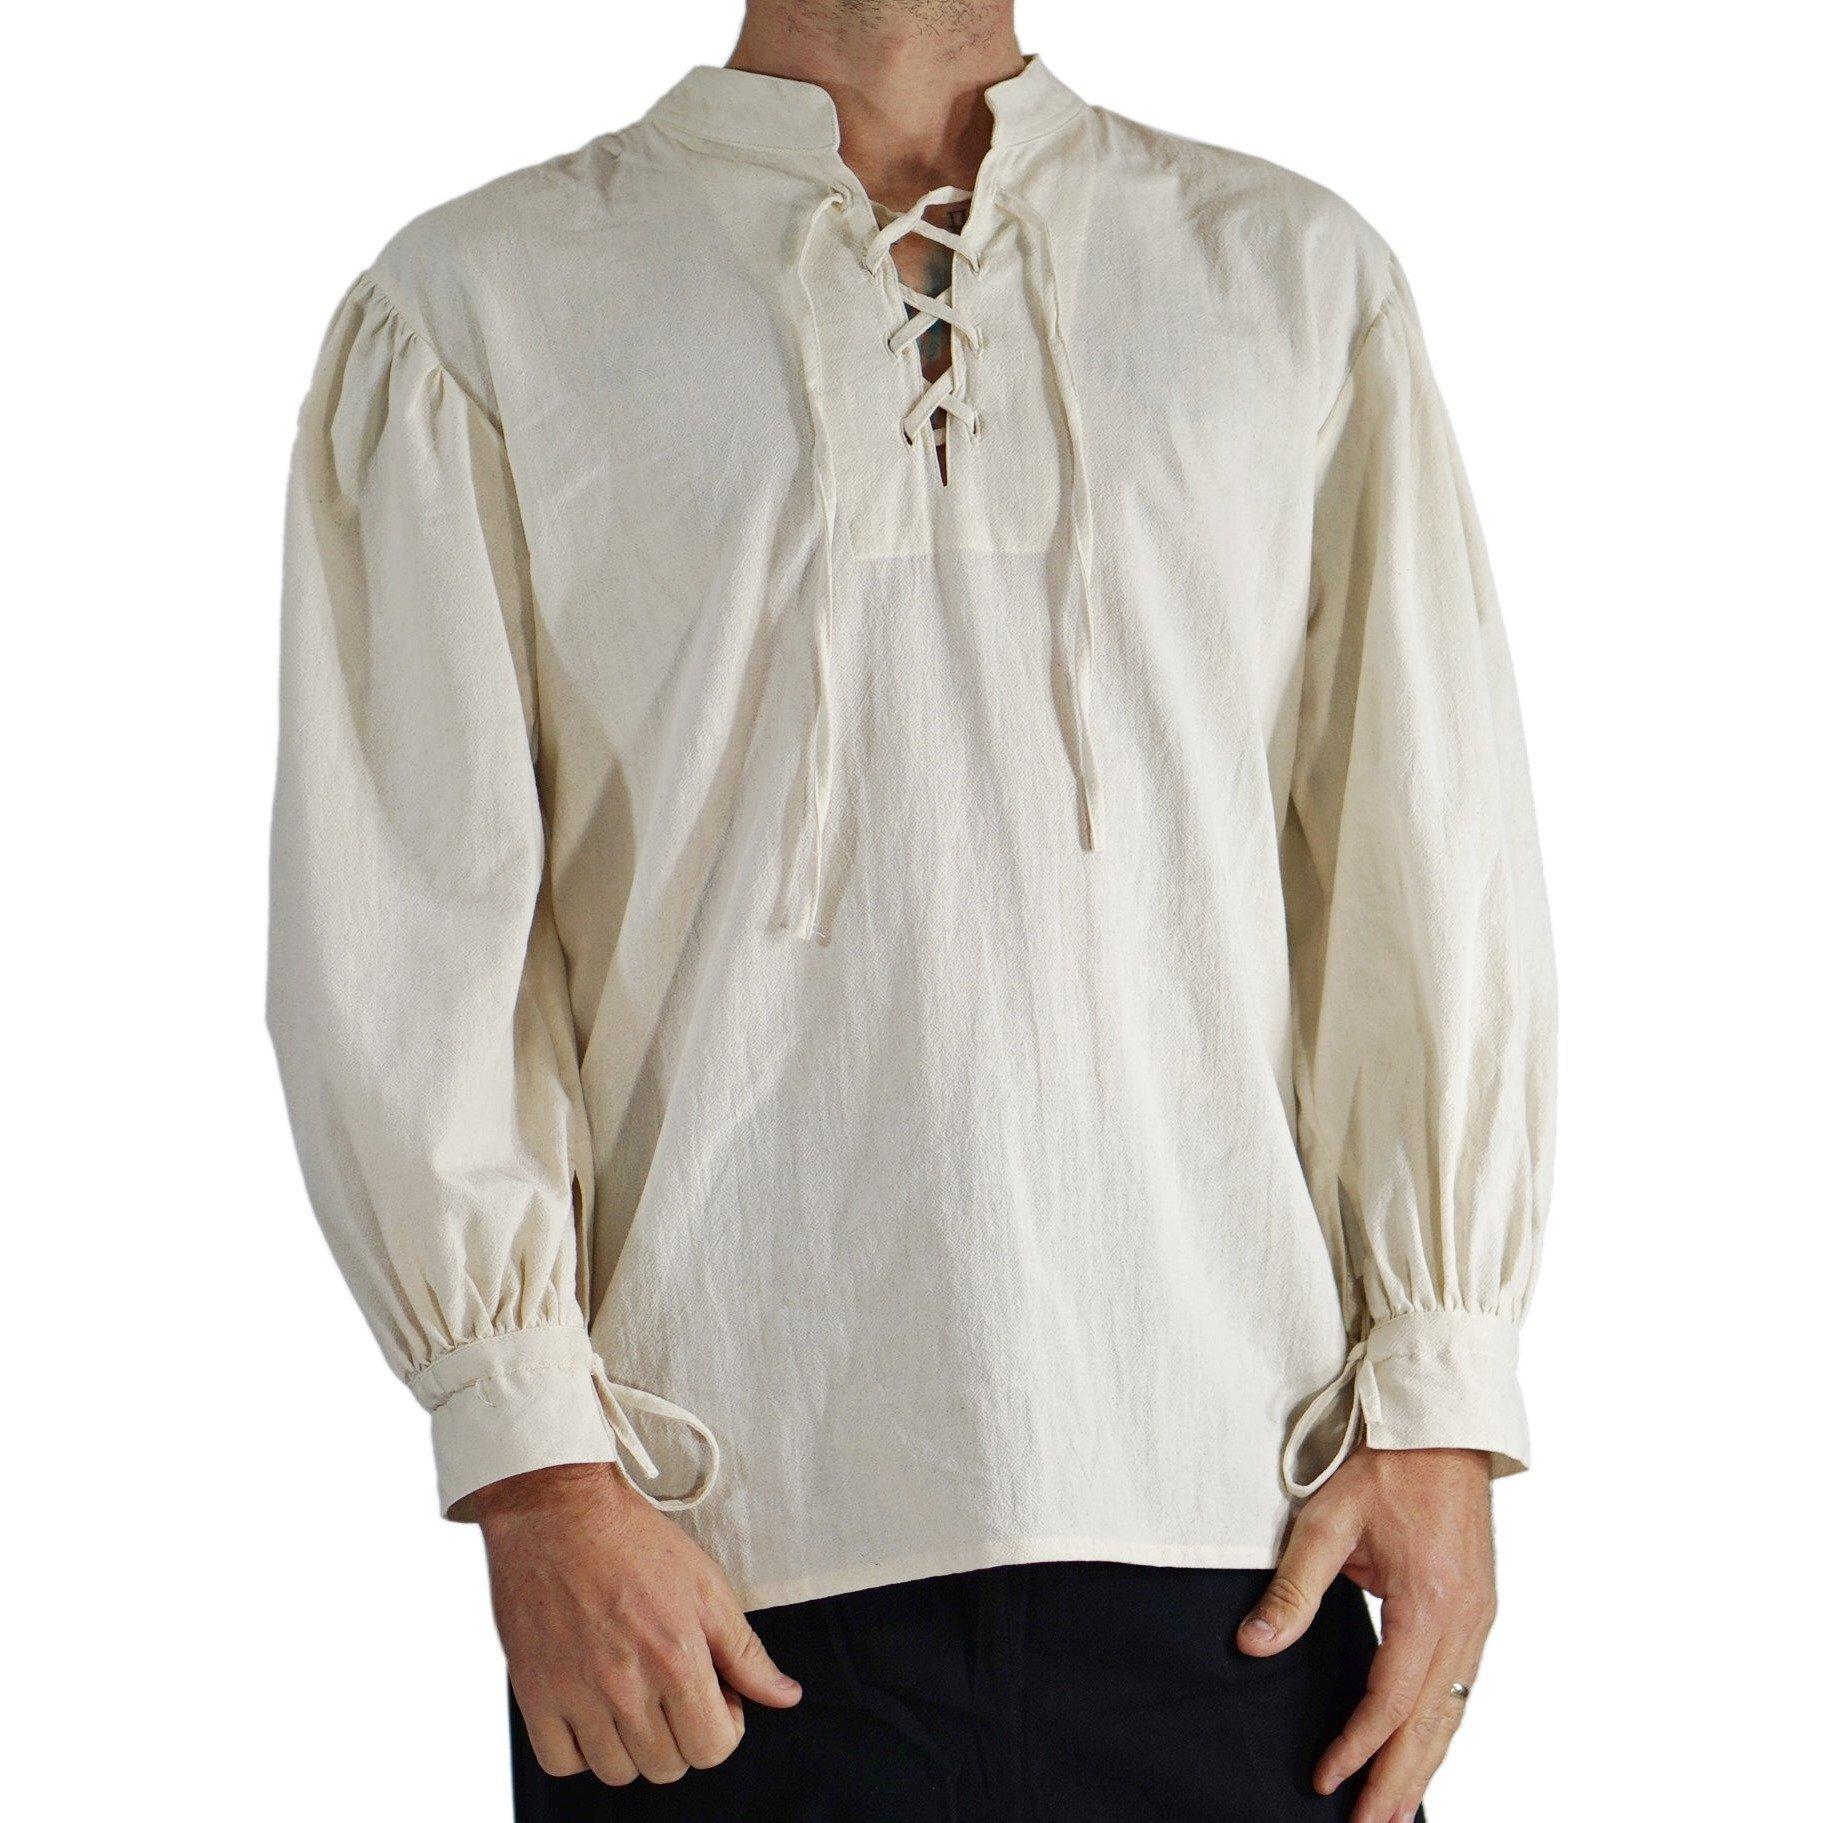 'Merchant' High Collar, Renaissance Festival Costume Shirt, Pirate, Steampunk - Cream/Off White by Zootzu (Image #2)